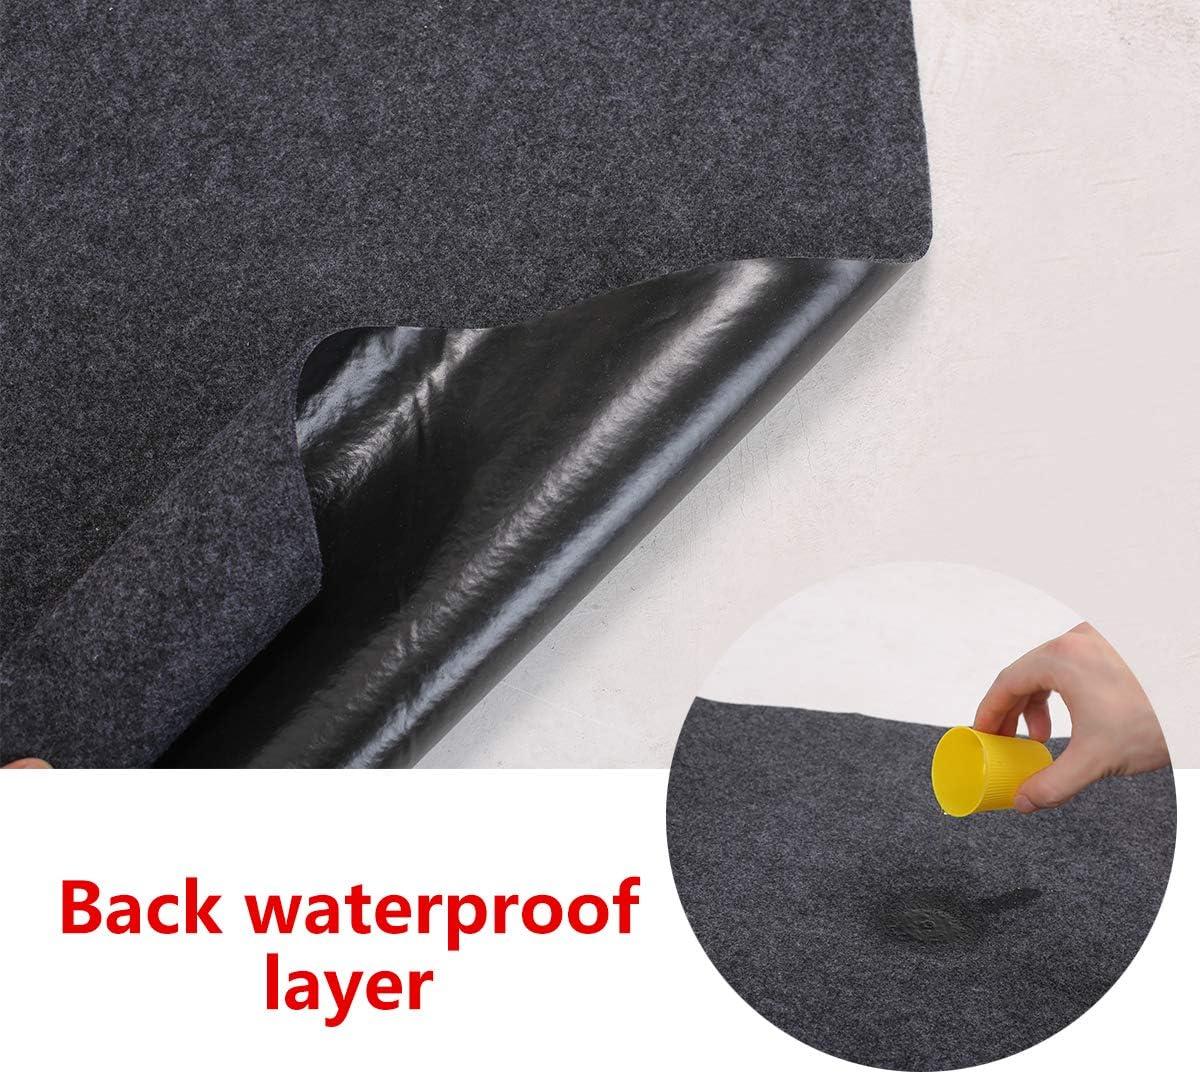 21.3 ft x 7.5 ft Indoor Parking Mat-Absorbent Felt and Leak-Resistant Anti-Slip Backing Easy to Clean Sensko Garage Floor Mat,Shearable